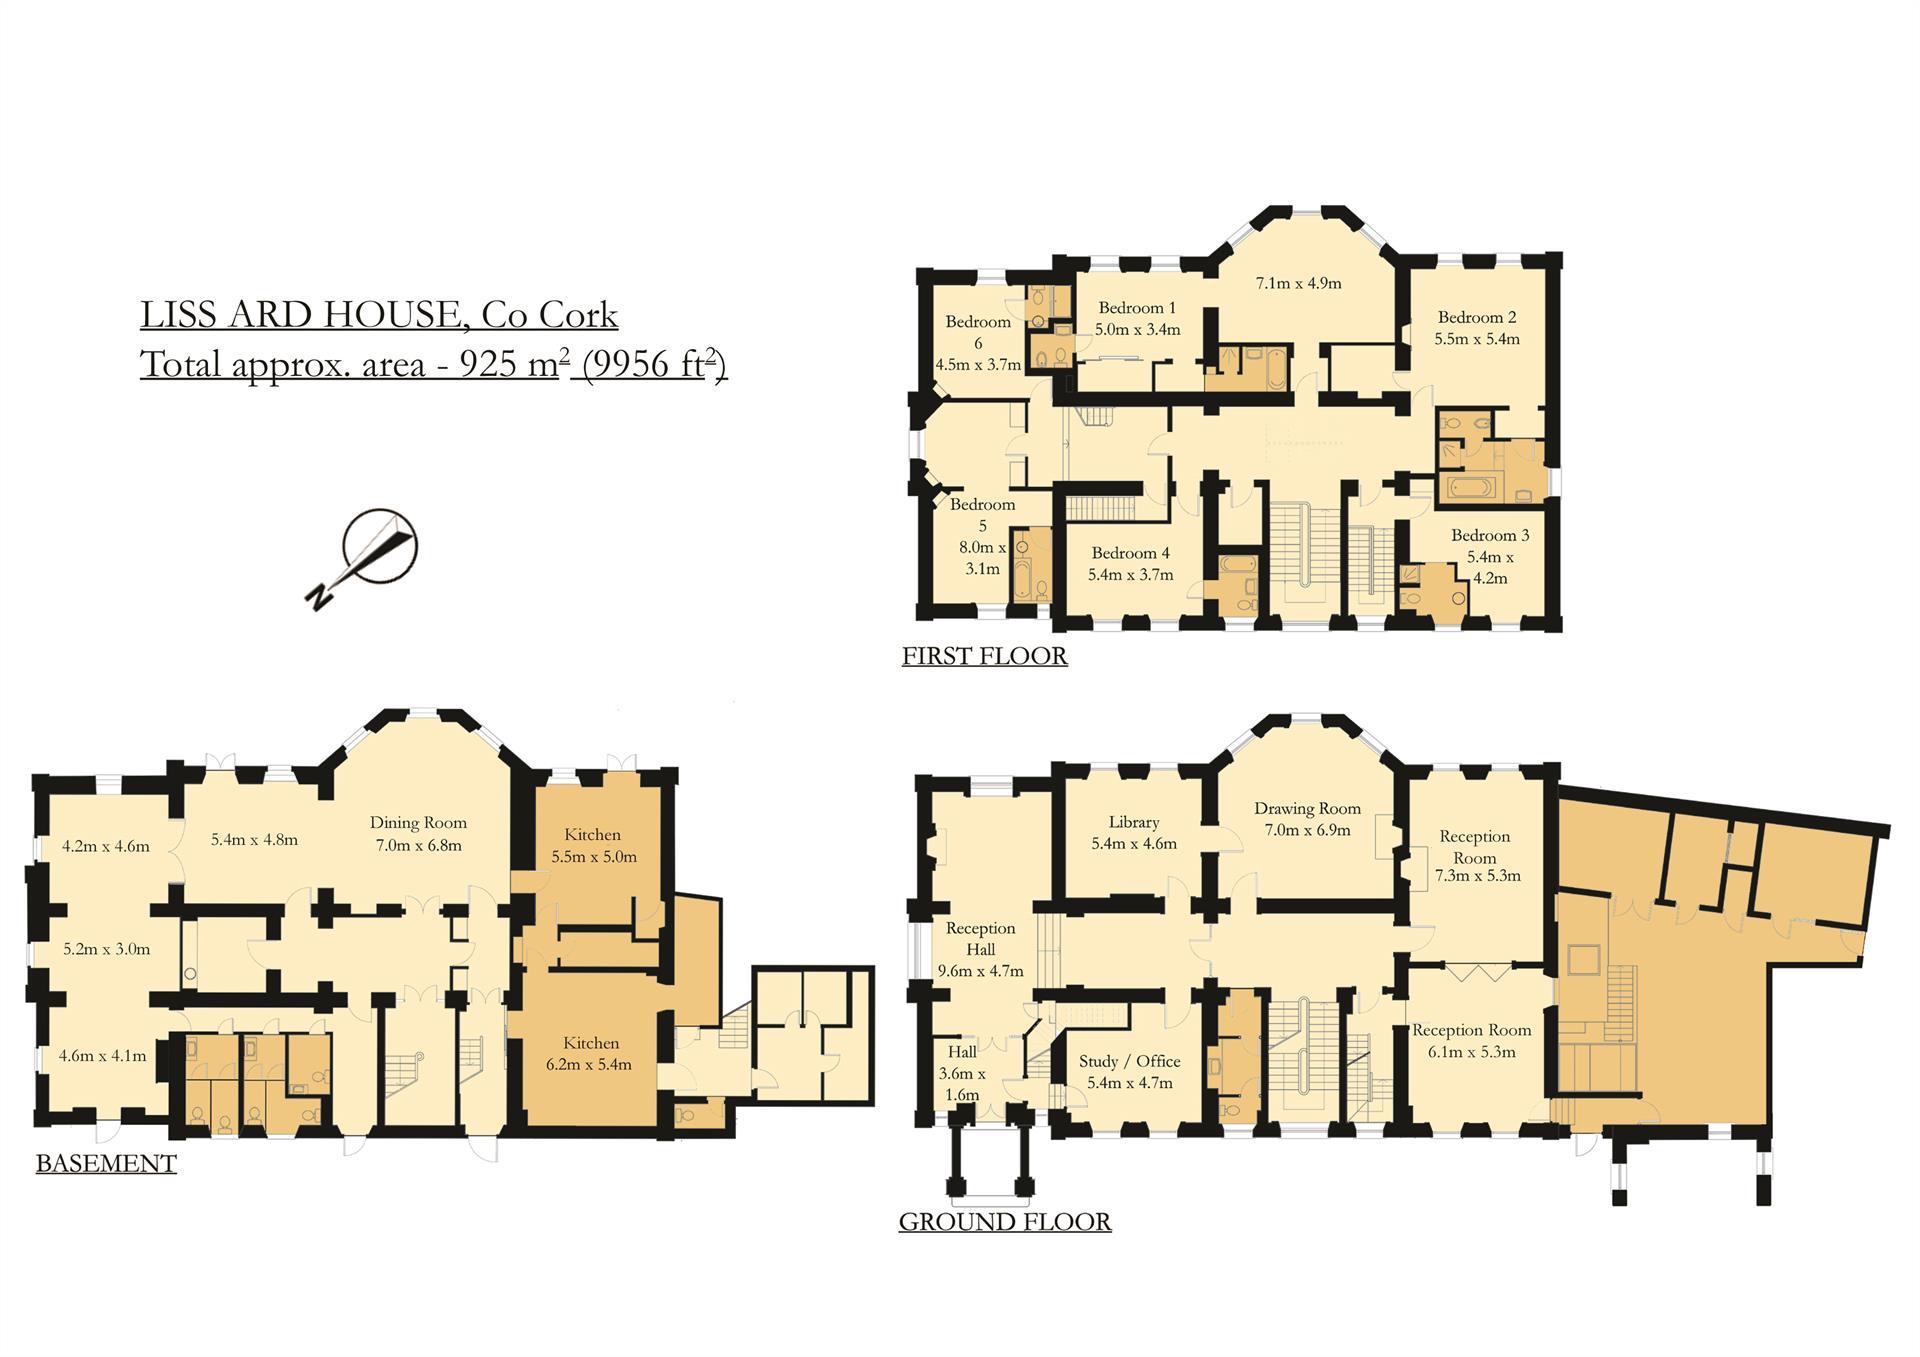 Estate for Sale at Liss Ard Estate, Skibbereen, County Cork Ireland